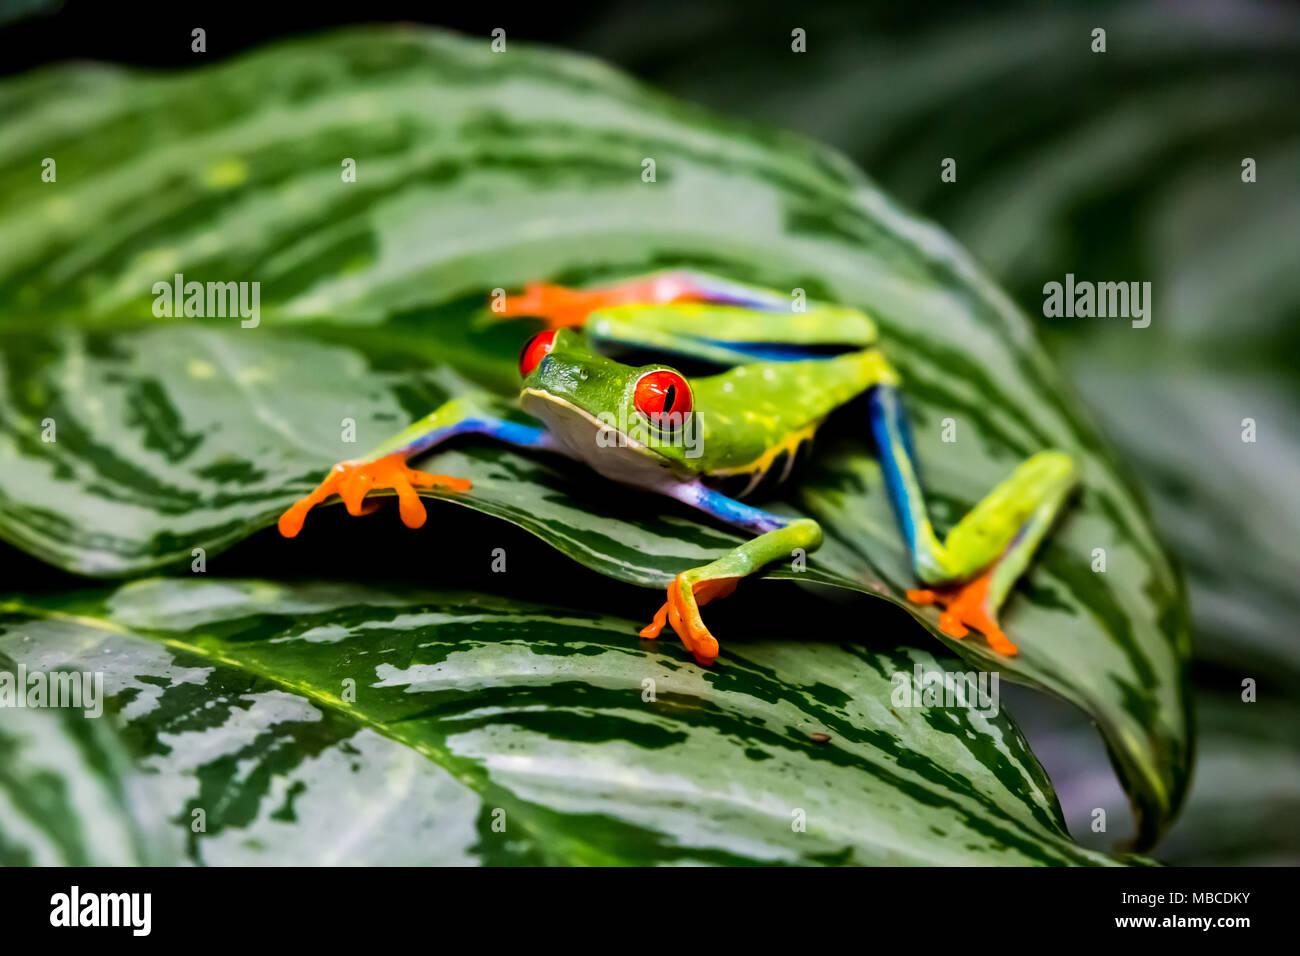 red eyed tree frog (Agalychnis callidryas) on green leaf Stock Photo